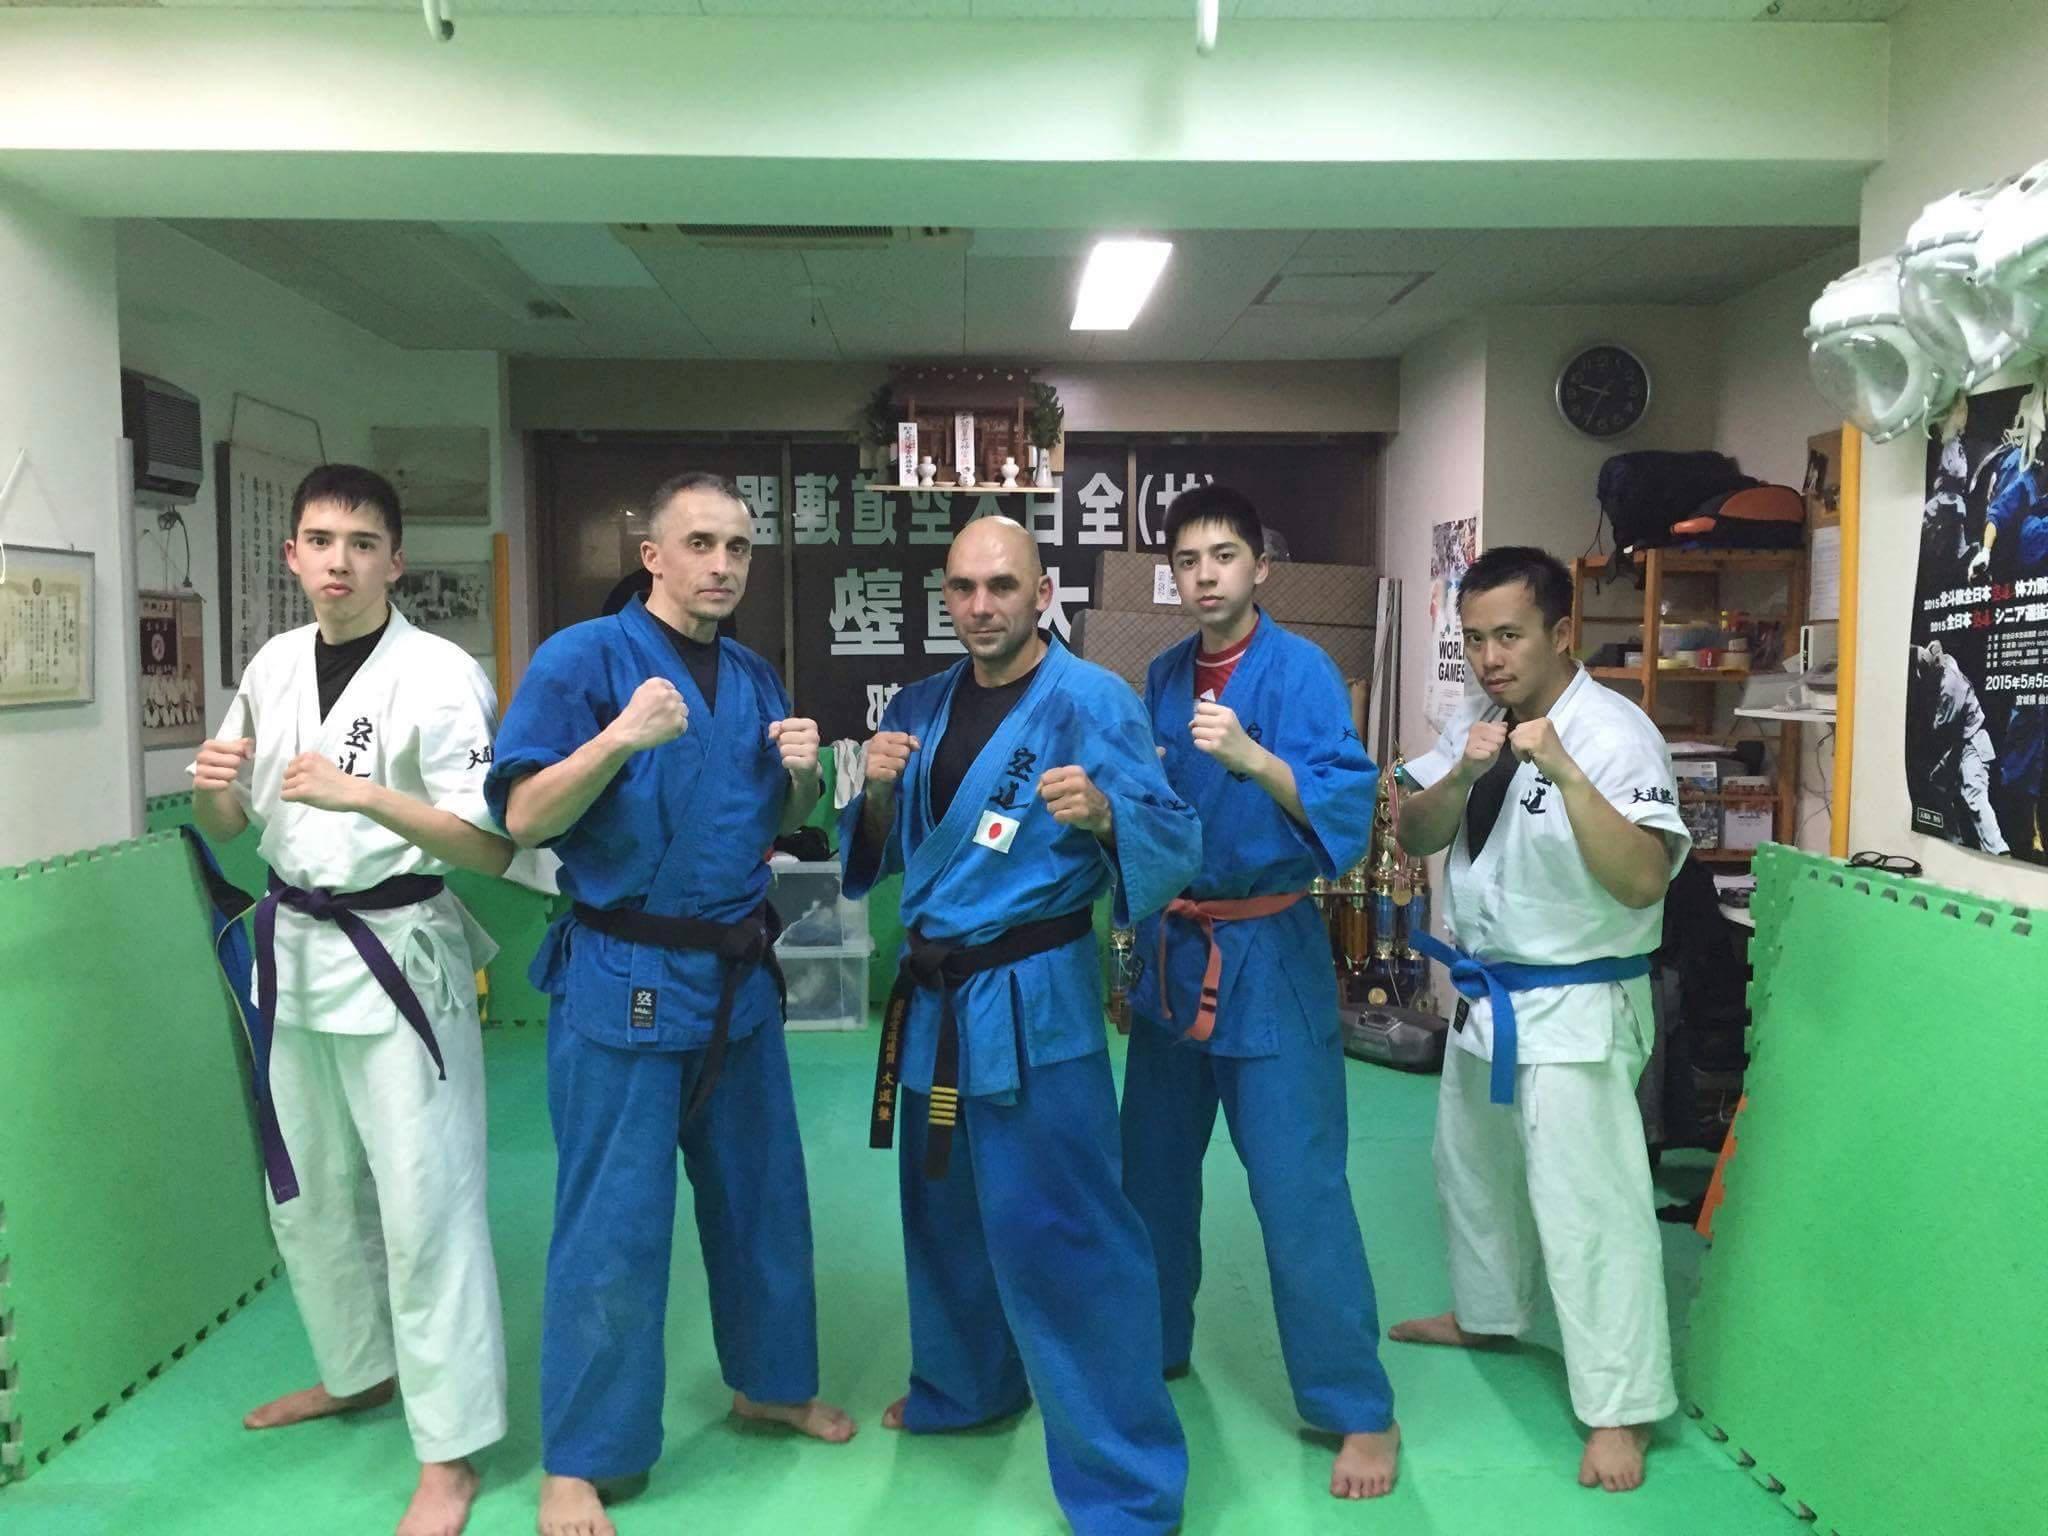 Echanges sportifs Rennes Sendai (Arts martiaux) : Association KUDO Rennes à Sendai !